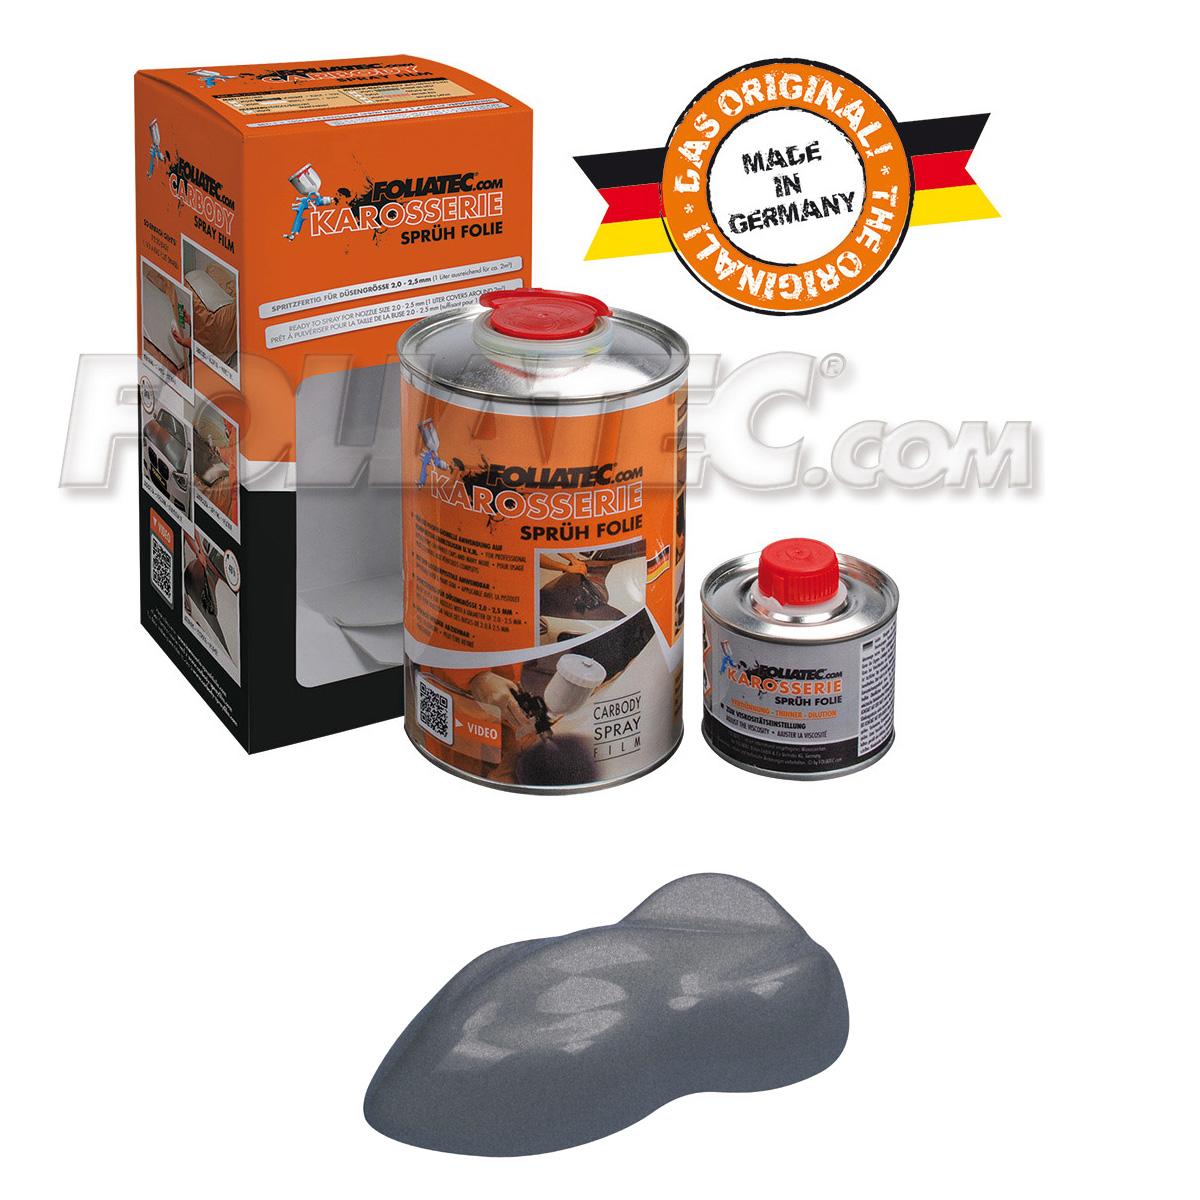 Foliatec Karosseriesprühfolie/Karosserie-Sprühfolie gunmetal grey/eisengrau